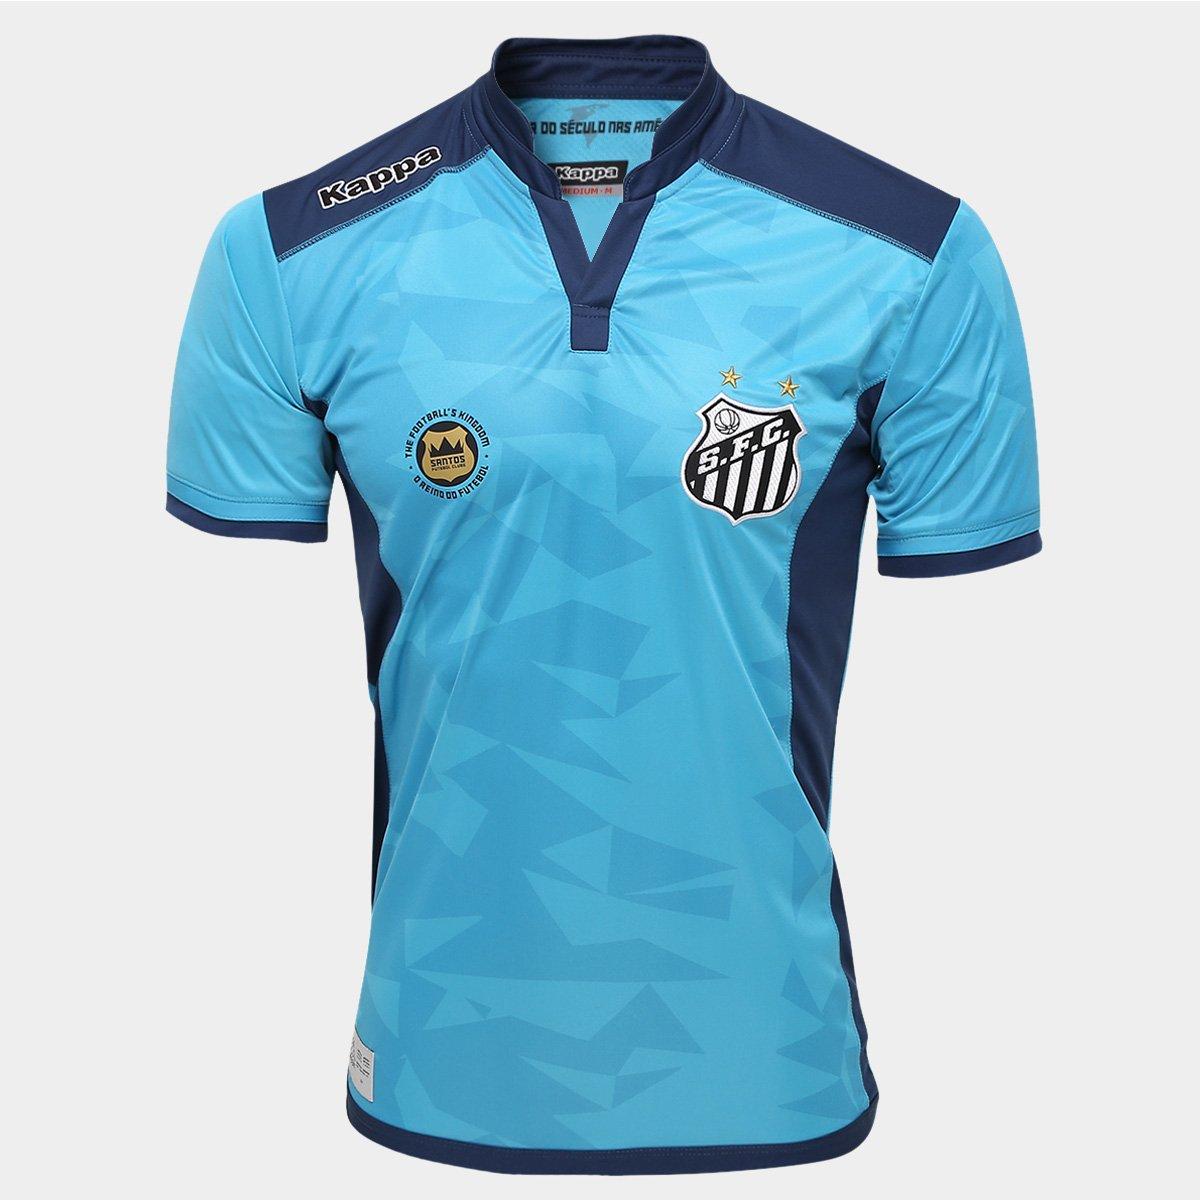 Camisa Santos Goleiro III 2016 s nº - Torcedor Kappa Masculina - Compre  Agora  f55288e652b1c